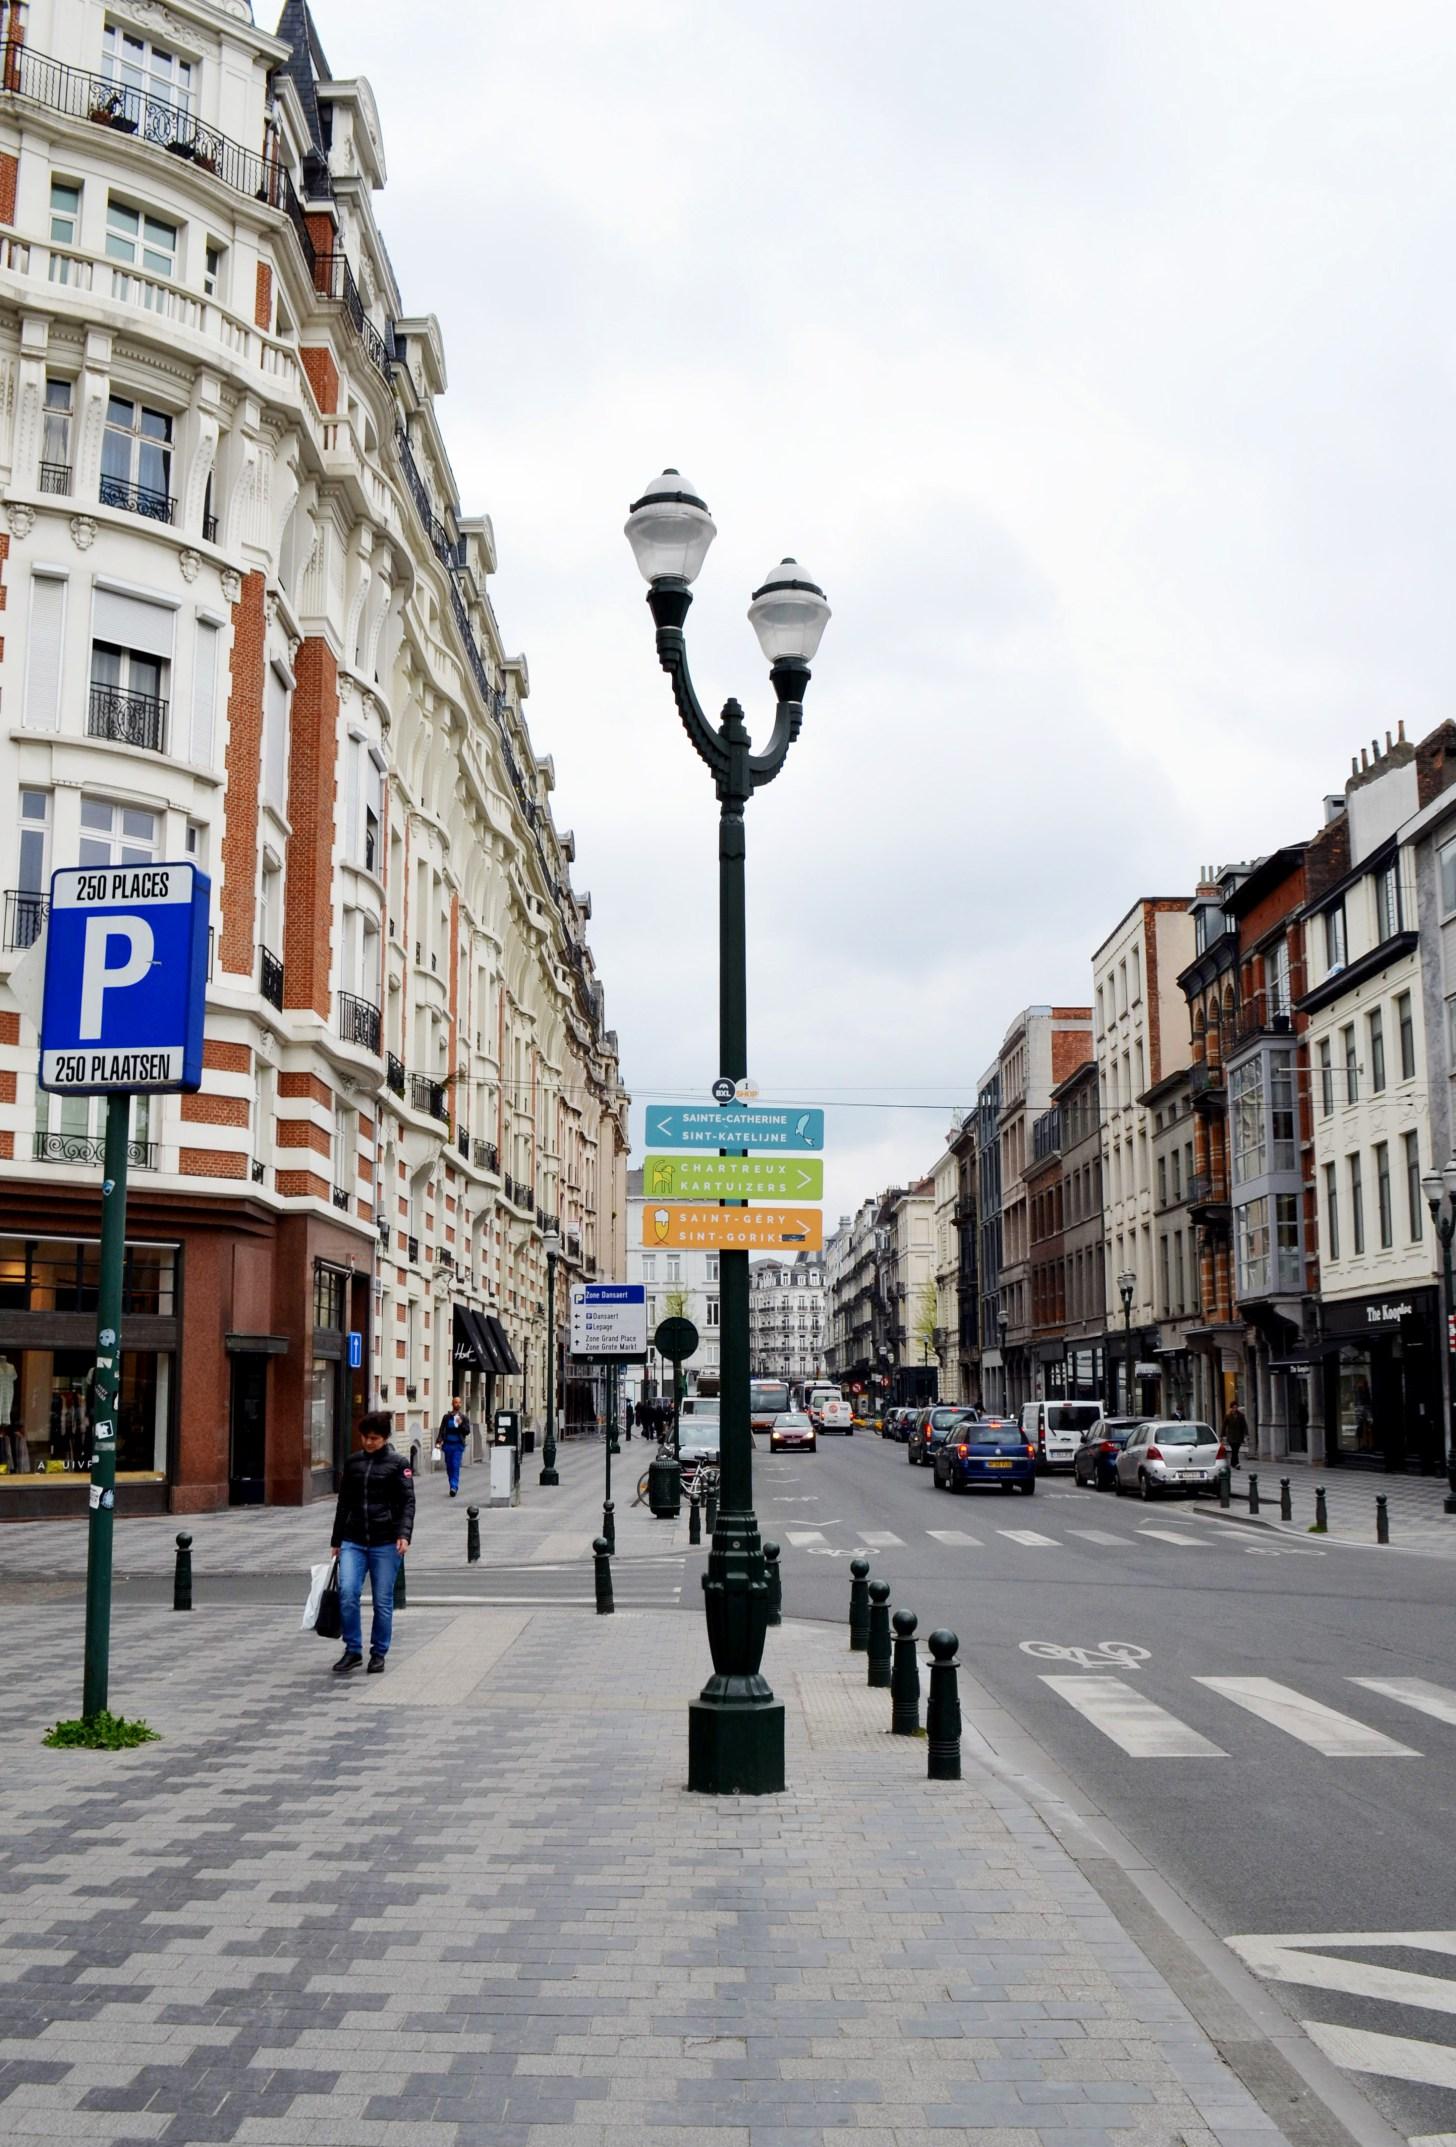 hotspots in Brussel